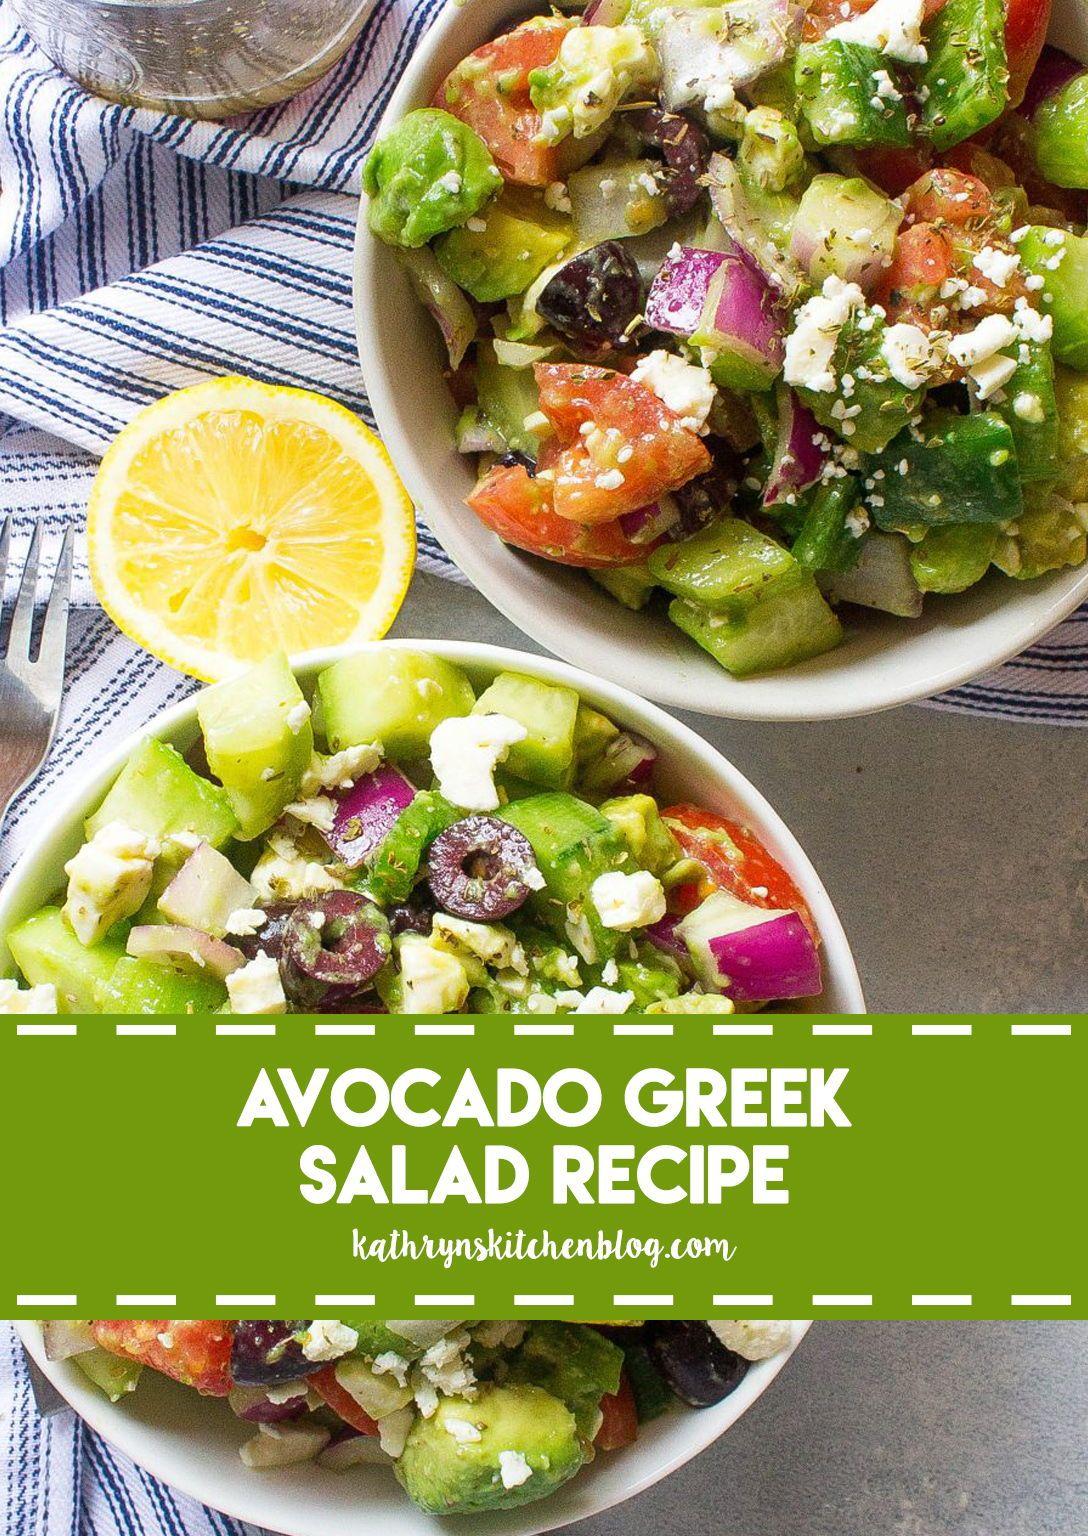 Avocado Greek Salad Recipe